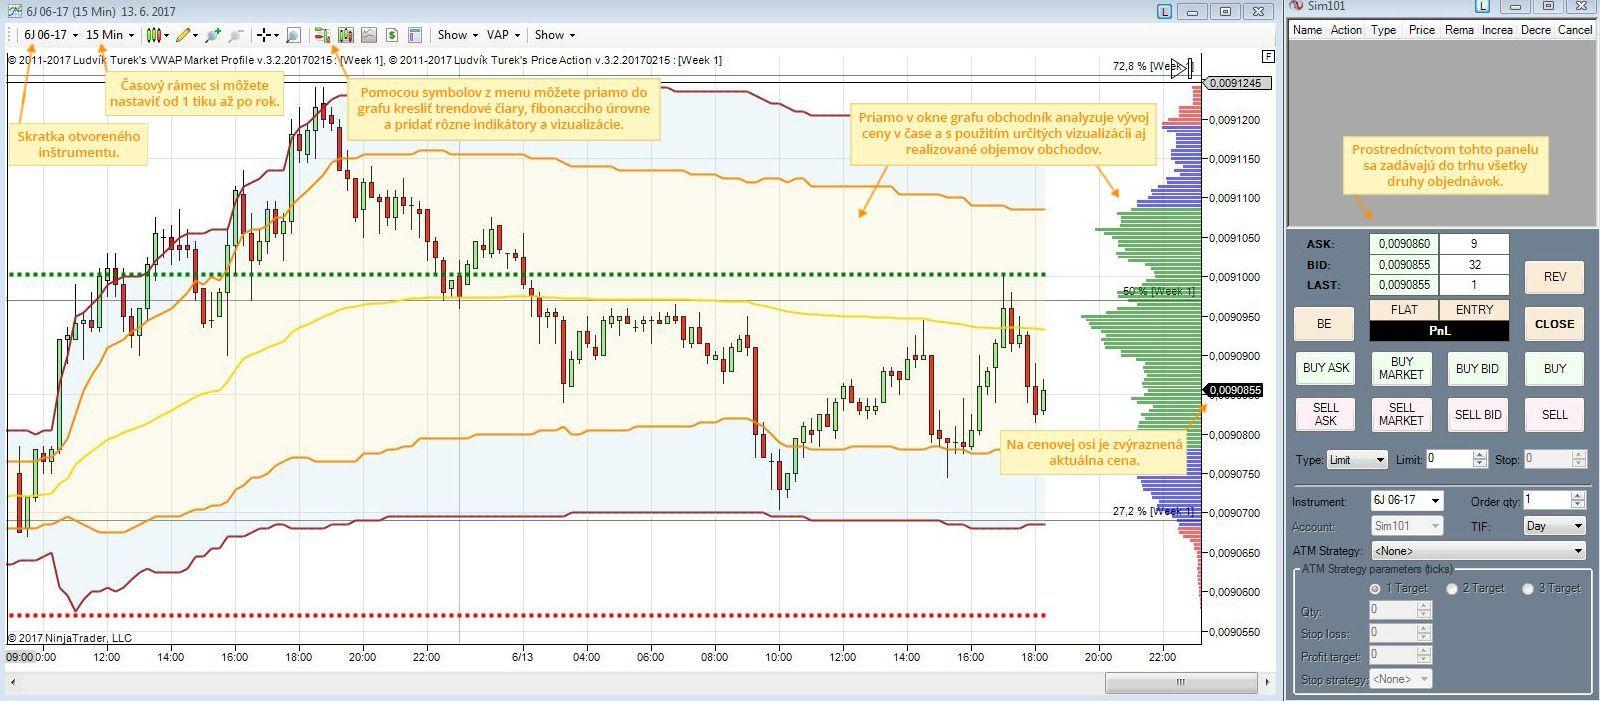 Analytický software - zobrazenie futures trhu japonského jenu (6J) pomocou vizualizácie VWAP market profile v software NinjaTrader 7